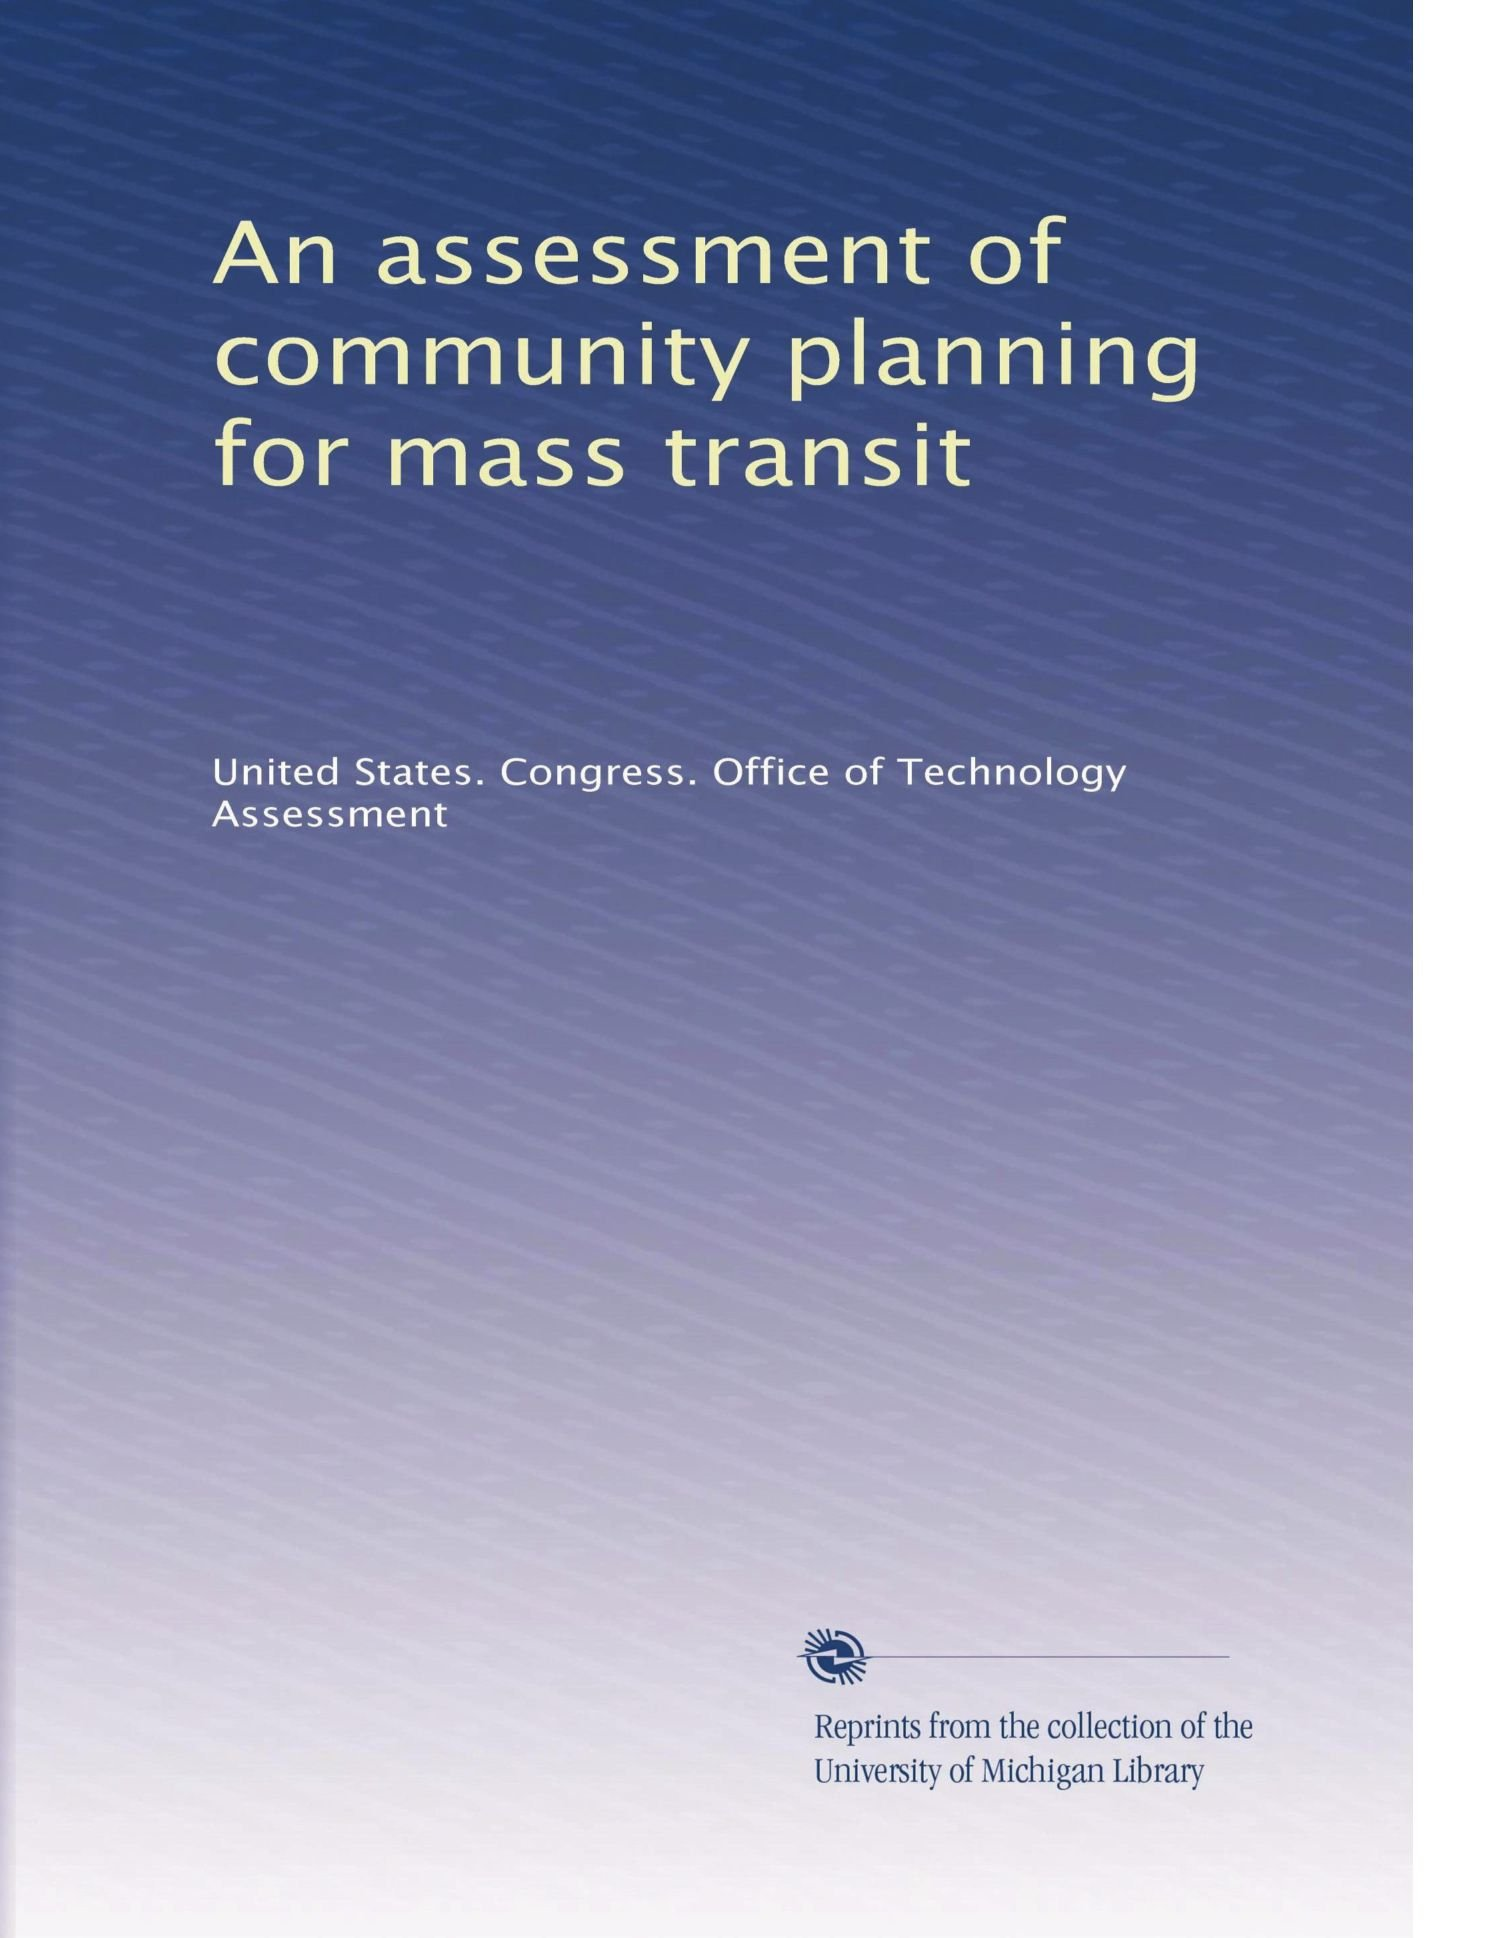 an-assessment-of-community-planning-for-mass-transit-volume-8